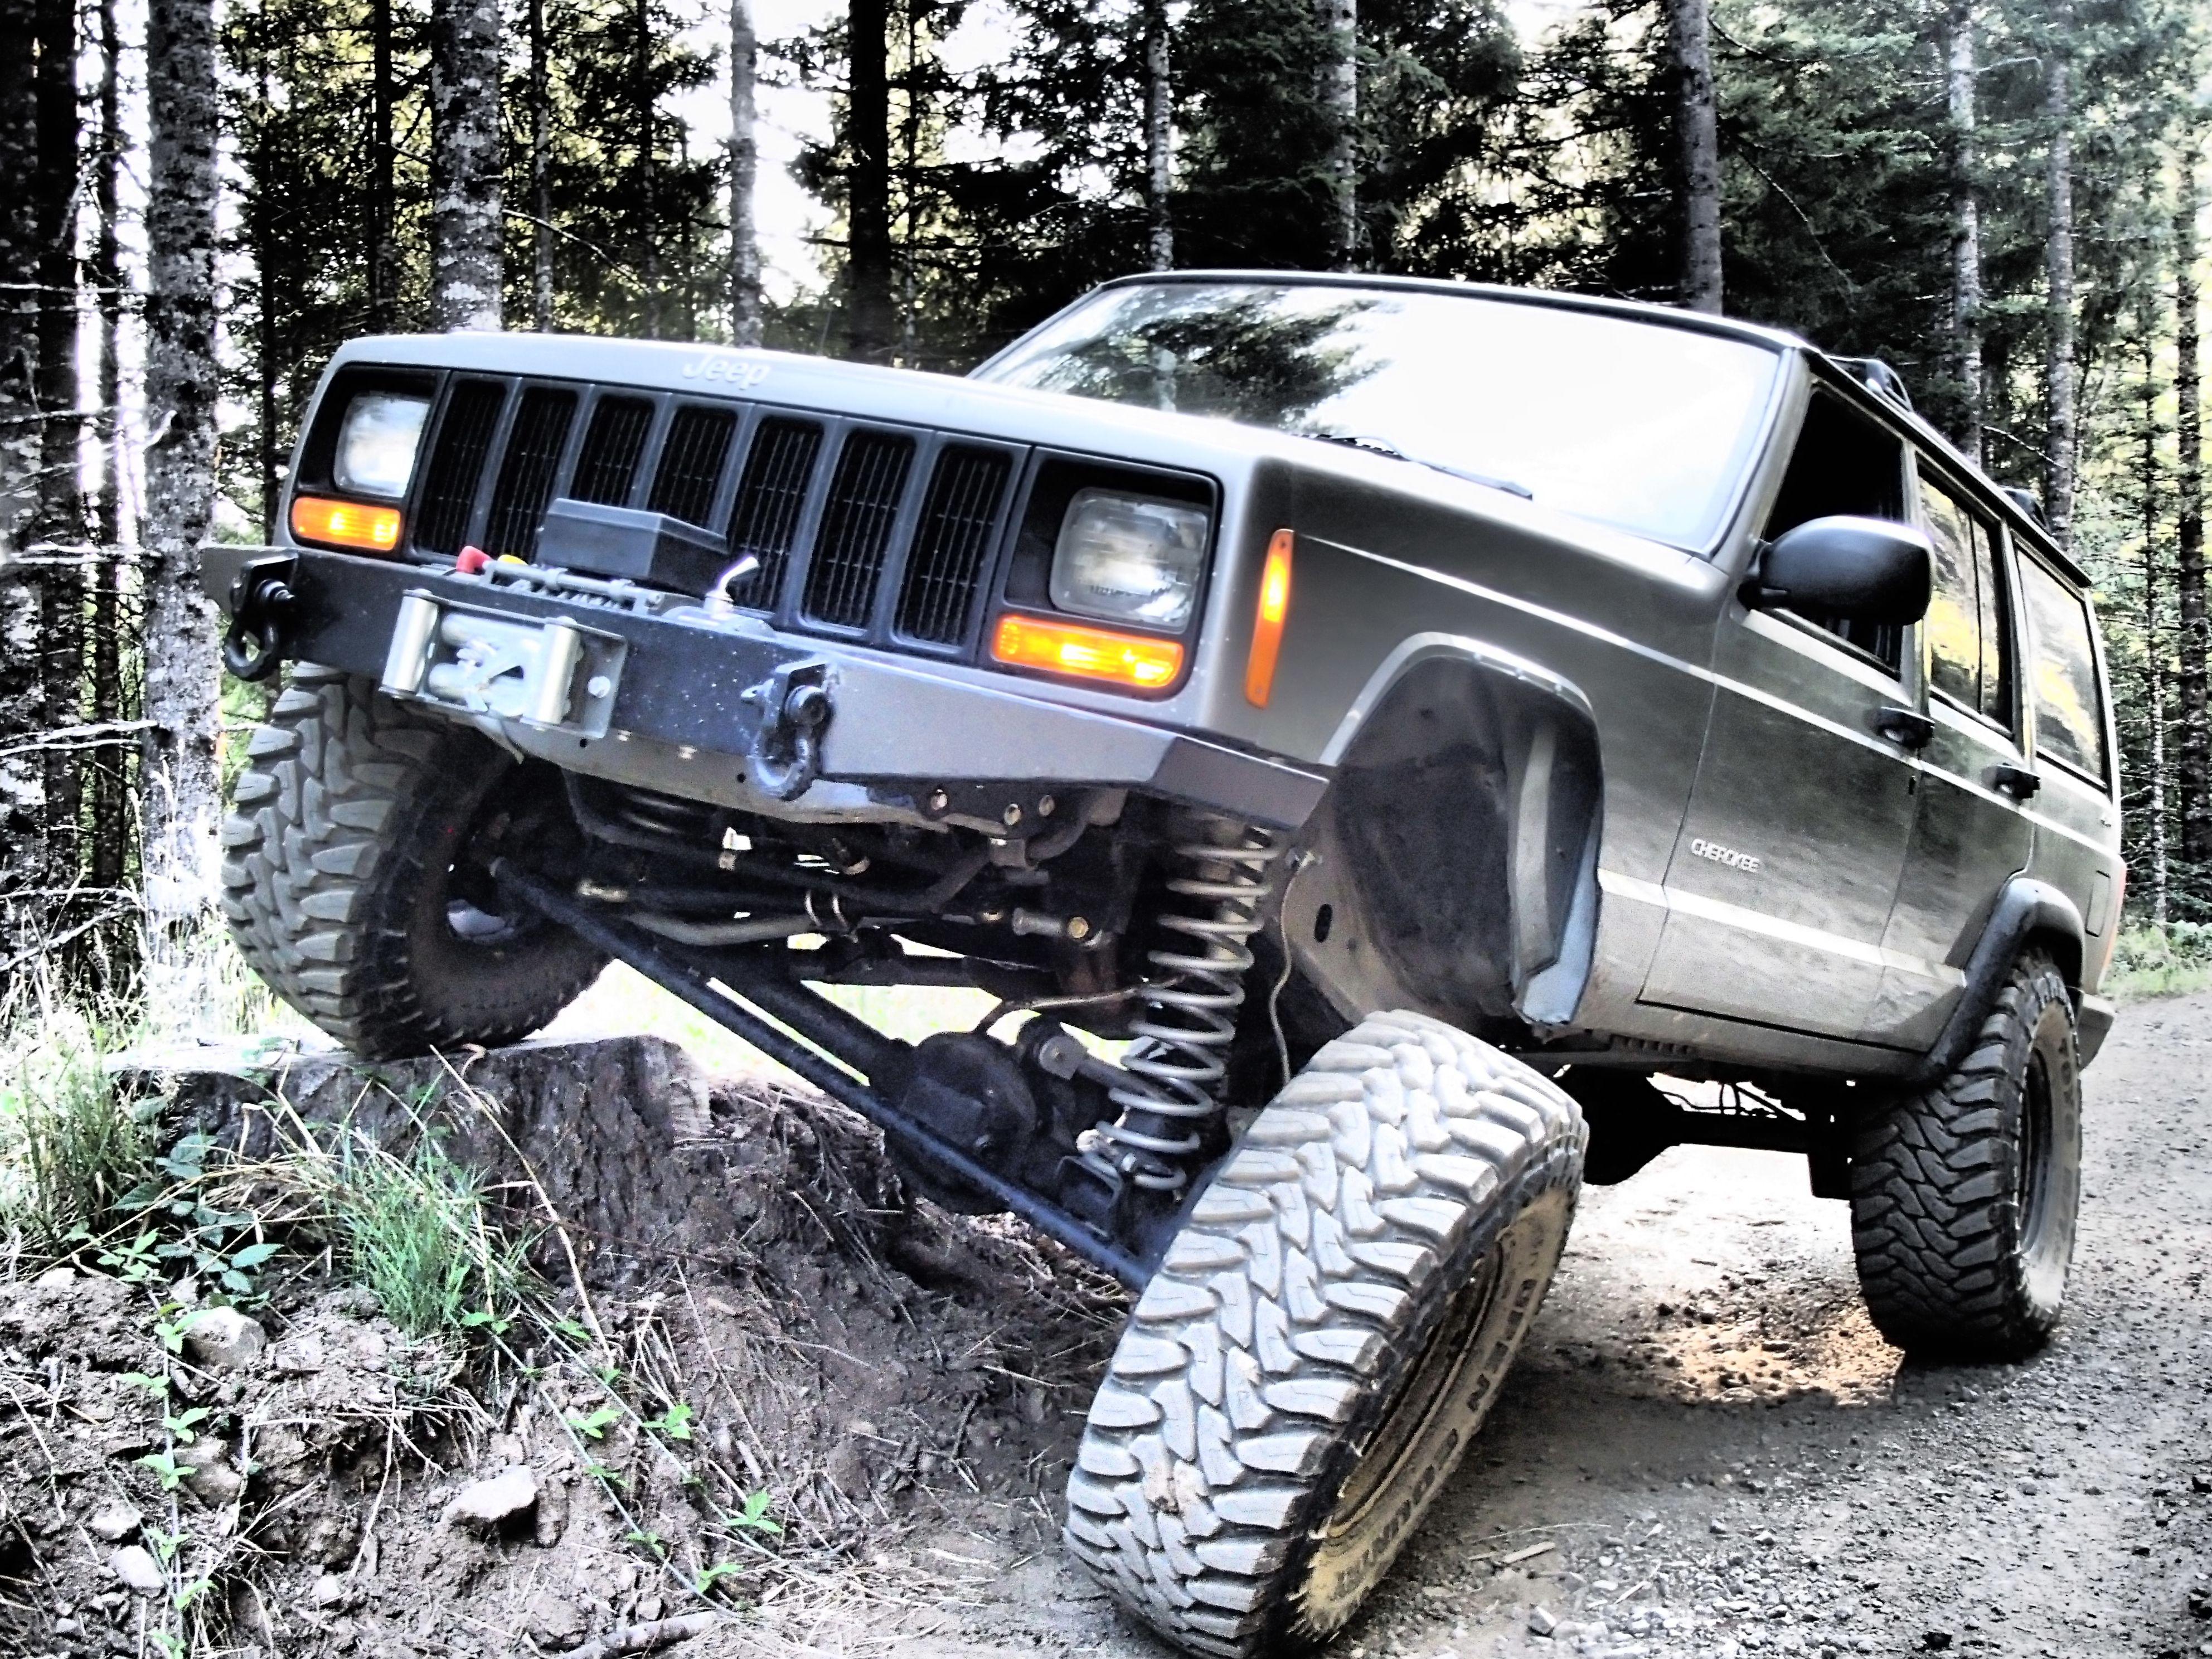 My 2001 Xj 5 5 Rubicon Long Arm Lockers 33 12 50 15s Any More Info Feel Free To Ask Its A Work In Progress Jeep Xj Jeep Cherokee Jeep Cherokee Xj